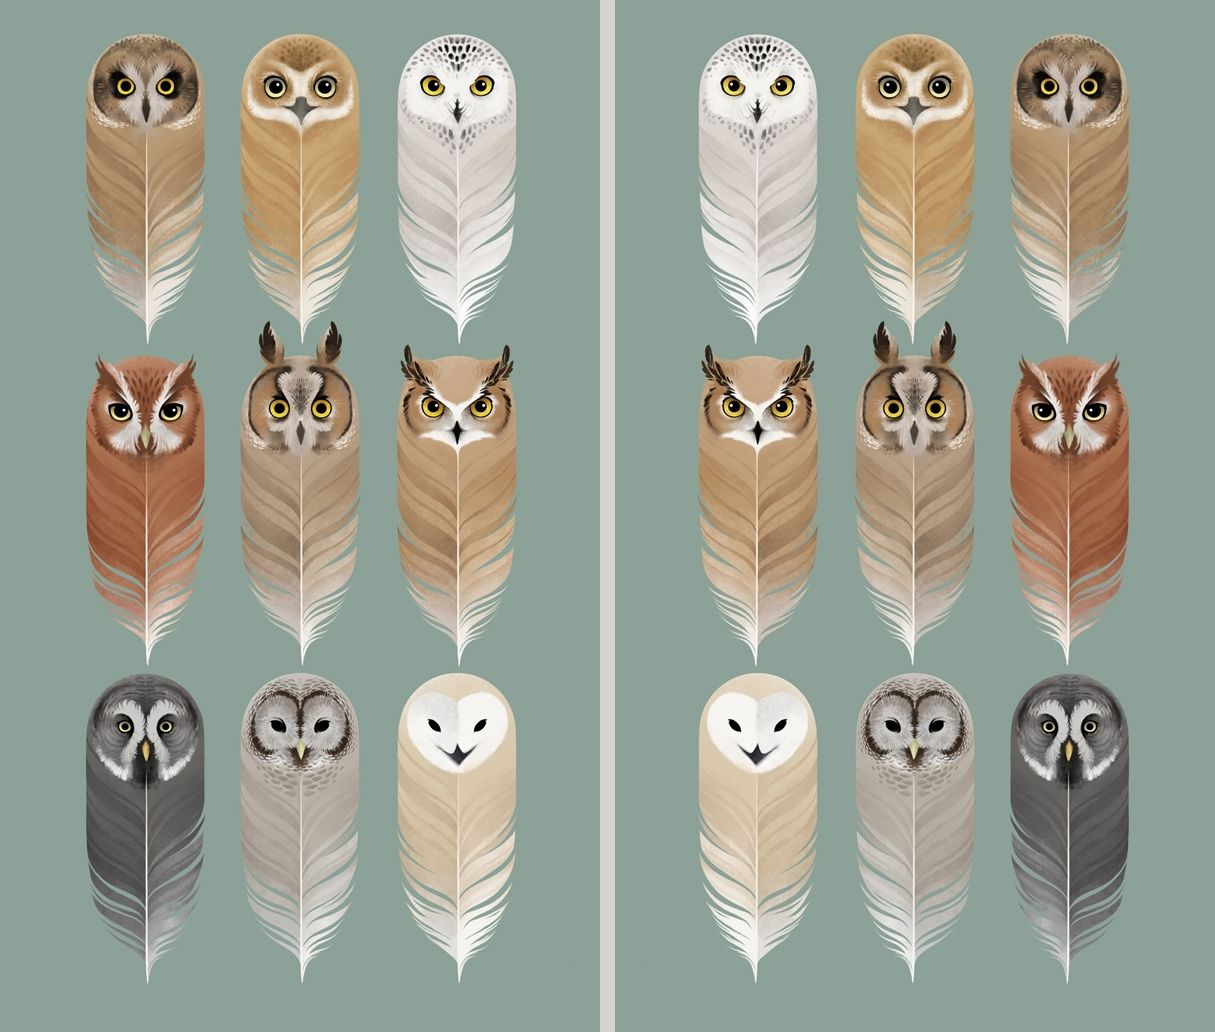 Pinyasmin Morgado On Cartoon   Pinterest   Manualidades - Free Printable Owl Bookmarks